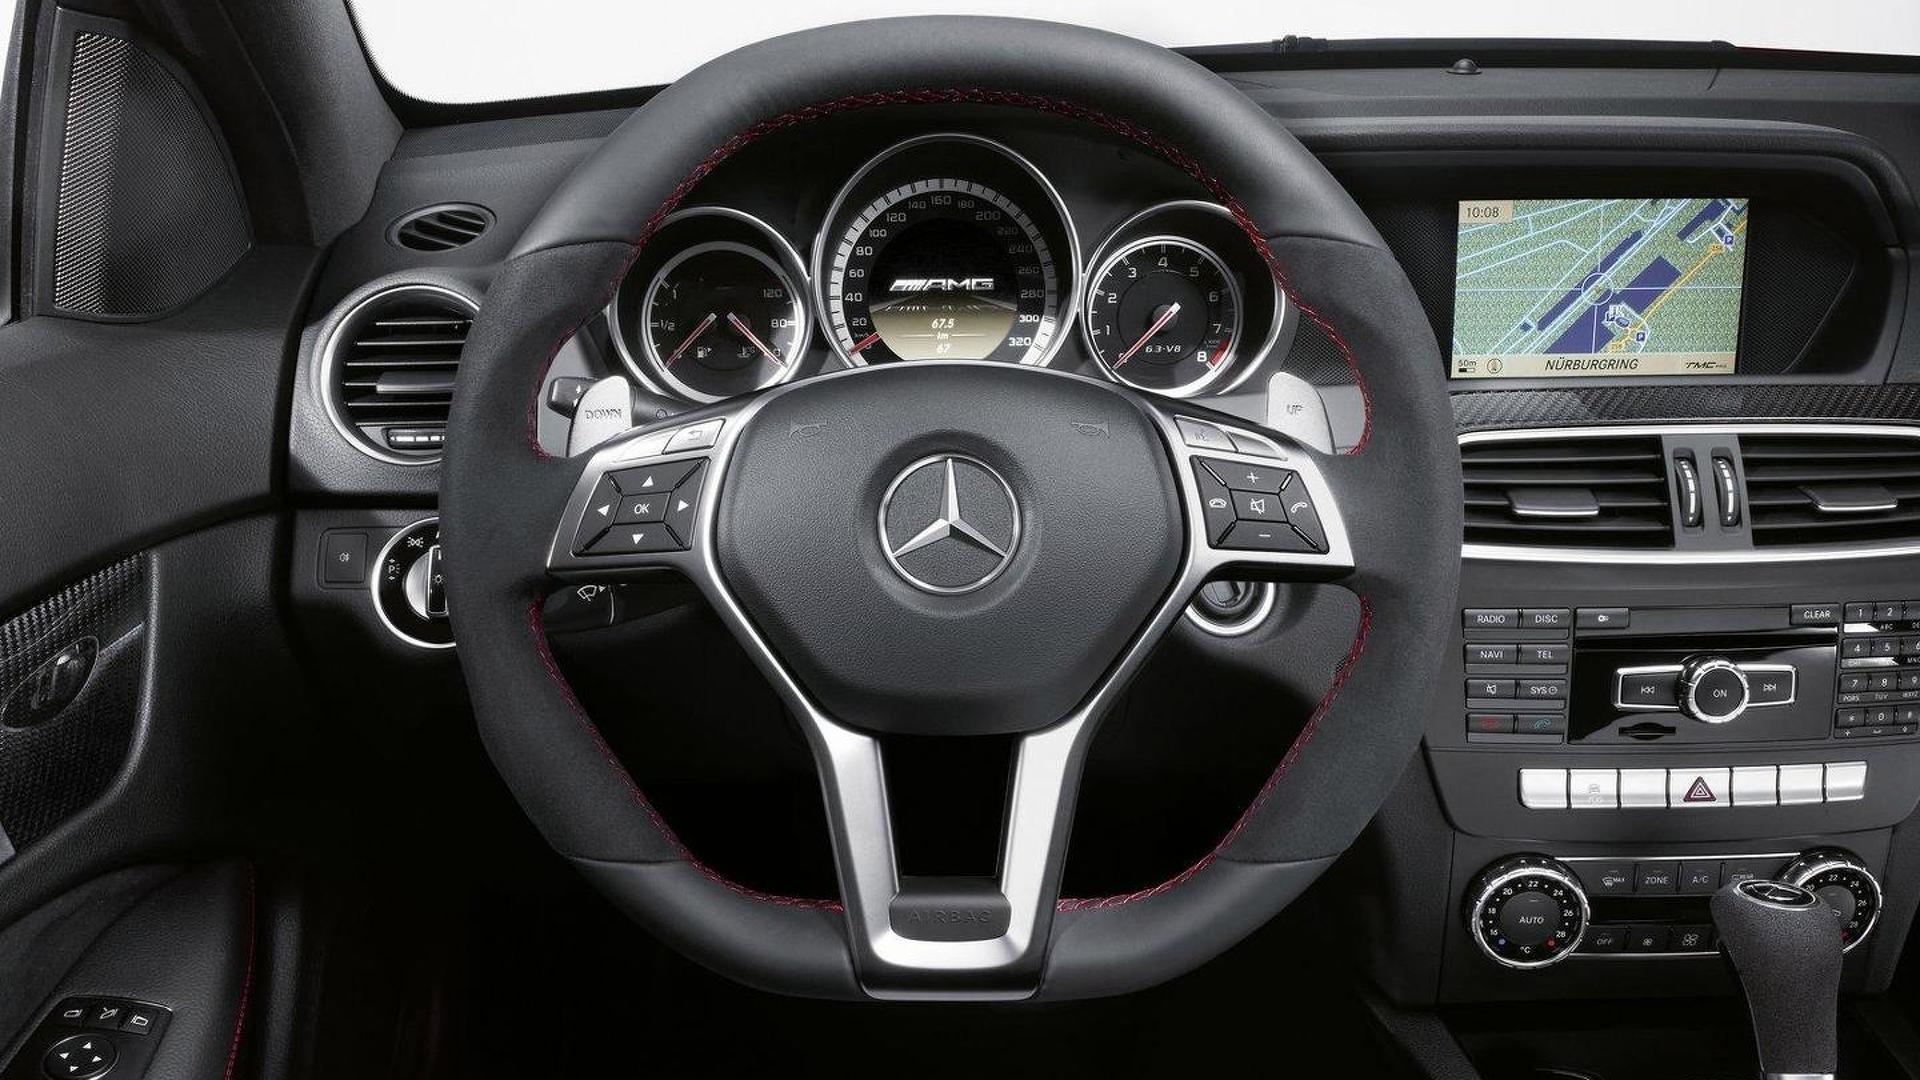 Mercedes Benz C63 AMG салон фото 3